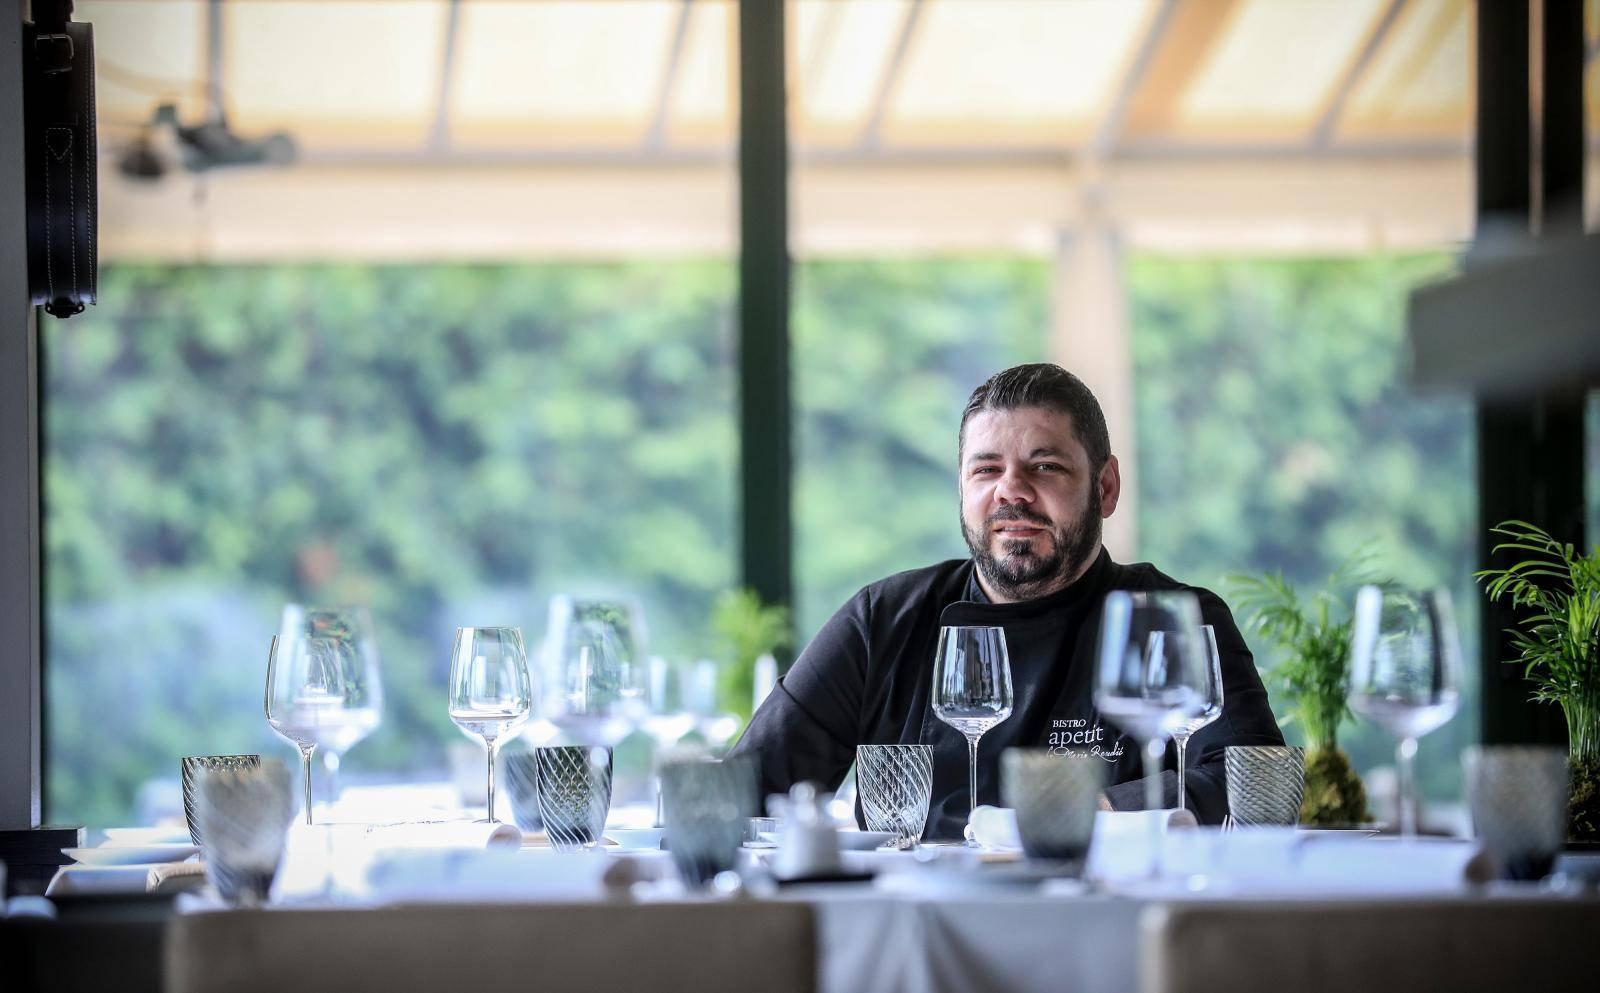 Stiže Chill&Grill: Na Bundeku će roštiljati i chef Marin Rendić